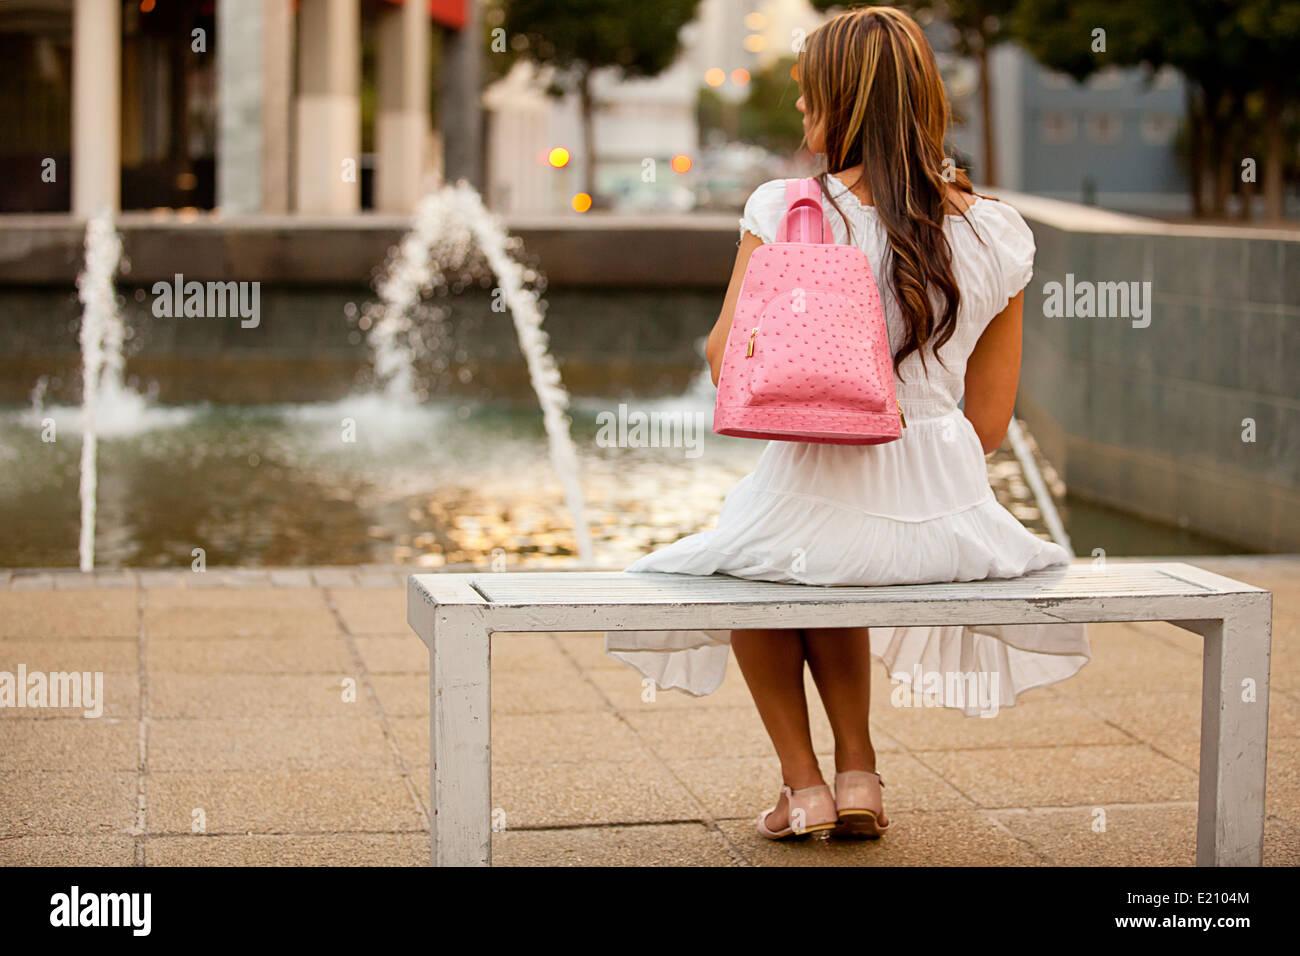 Feminine lady modeling a pink leather backpack wearing blue denim shirt and white skirt - Stock Image